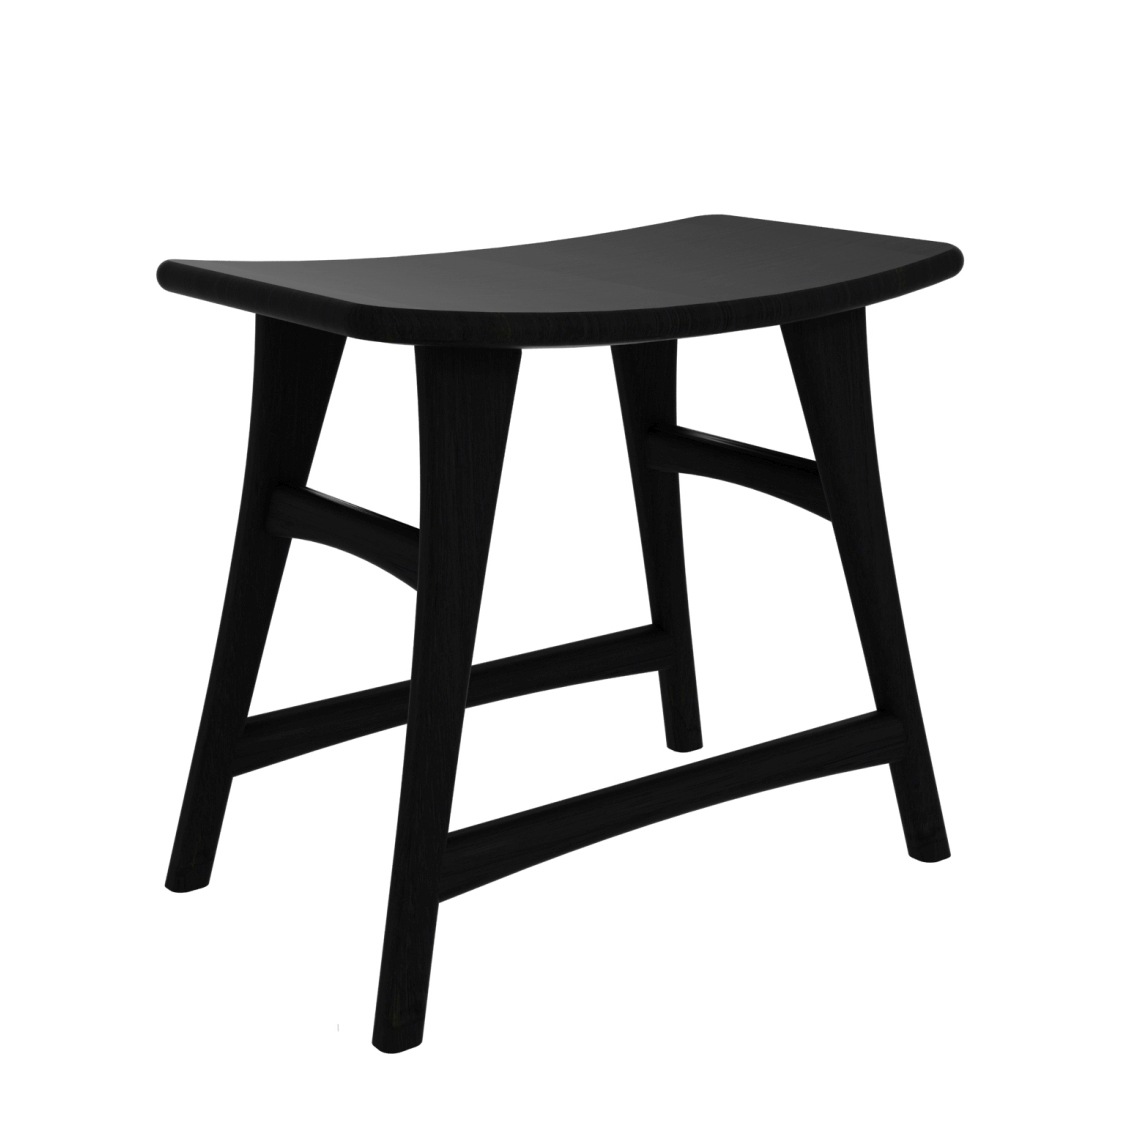 hocker blackstone osso 53040 st hle hocker b nke ethnicraft eiche brands exedra. Black Bedroom Furniture Sets. Home Design Ideas